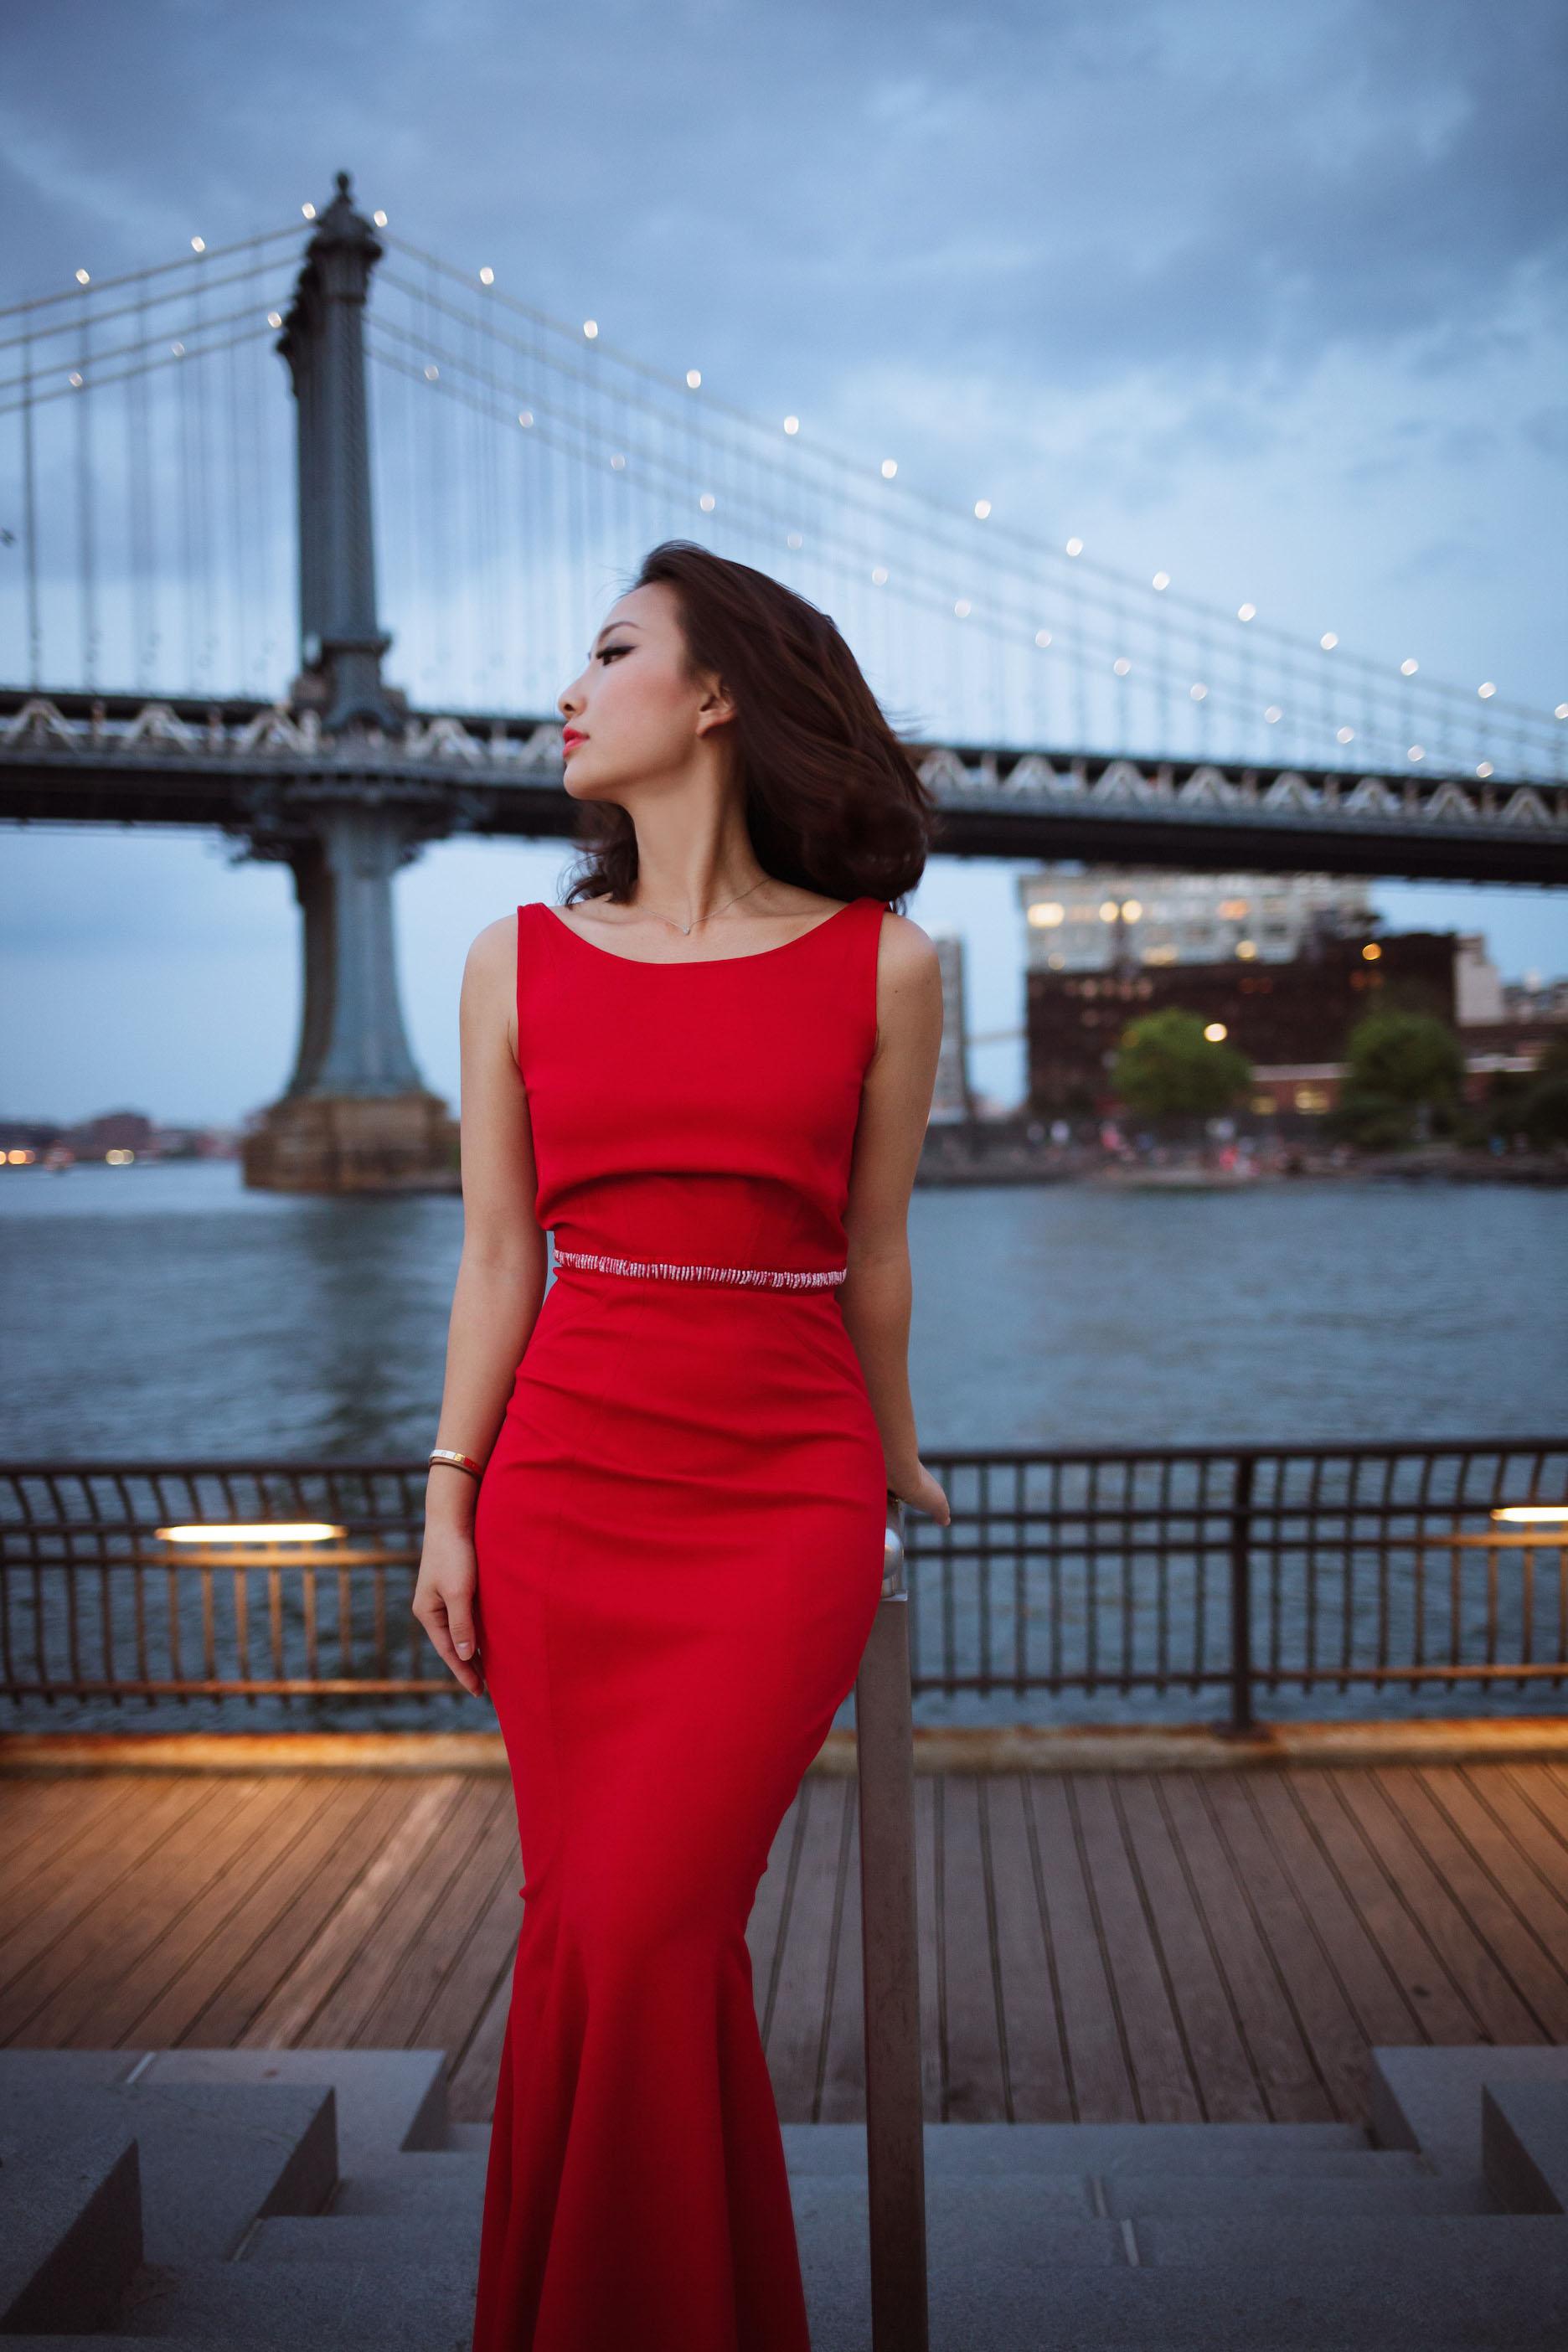 Zac Posen Red evening gown copy.jpg